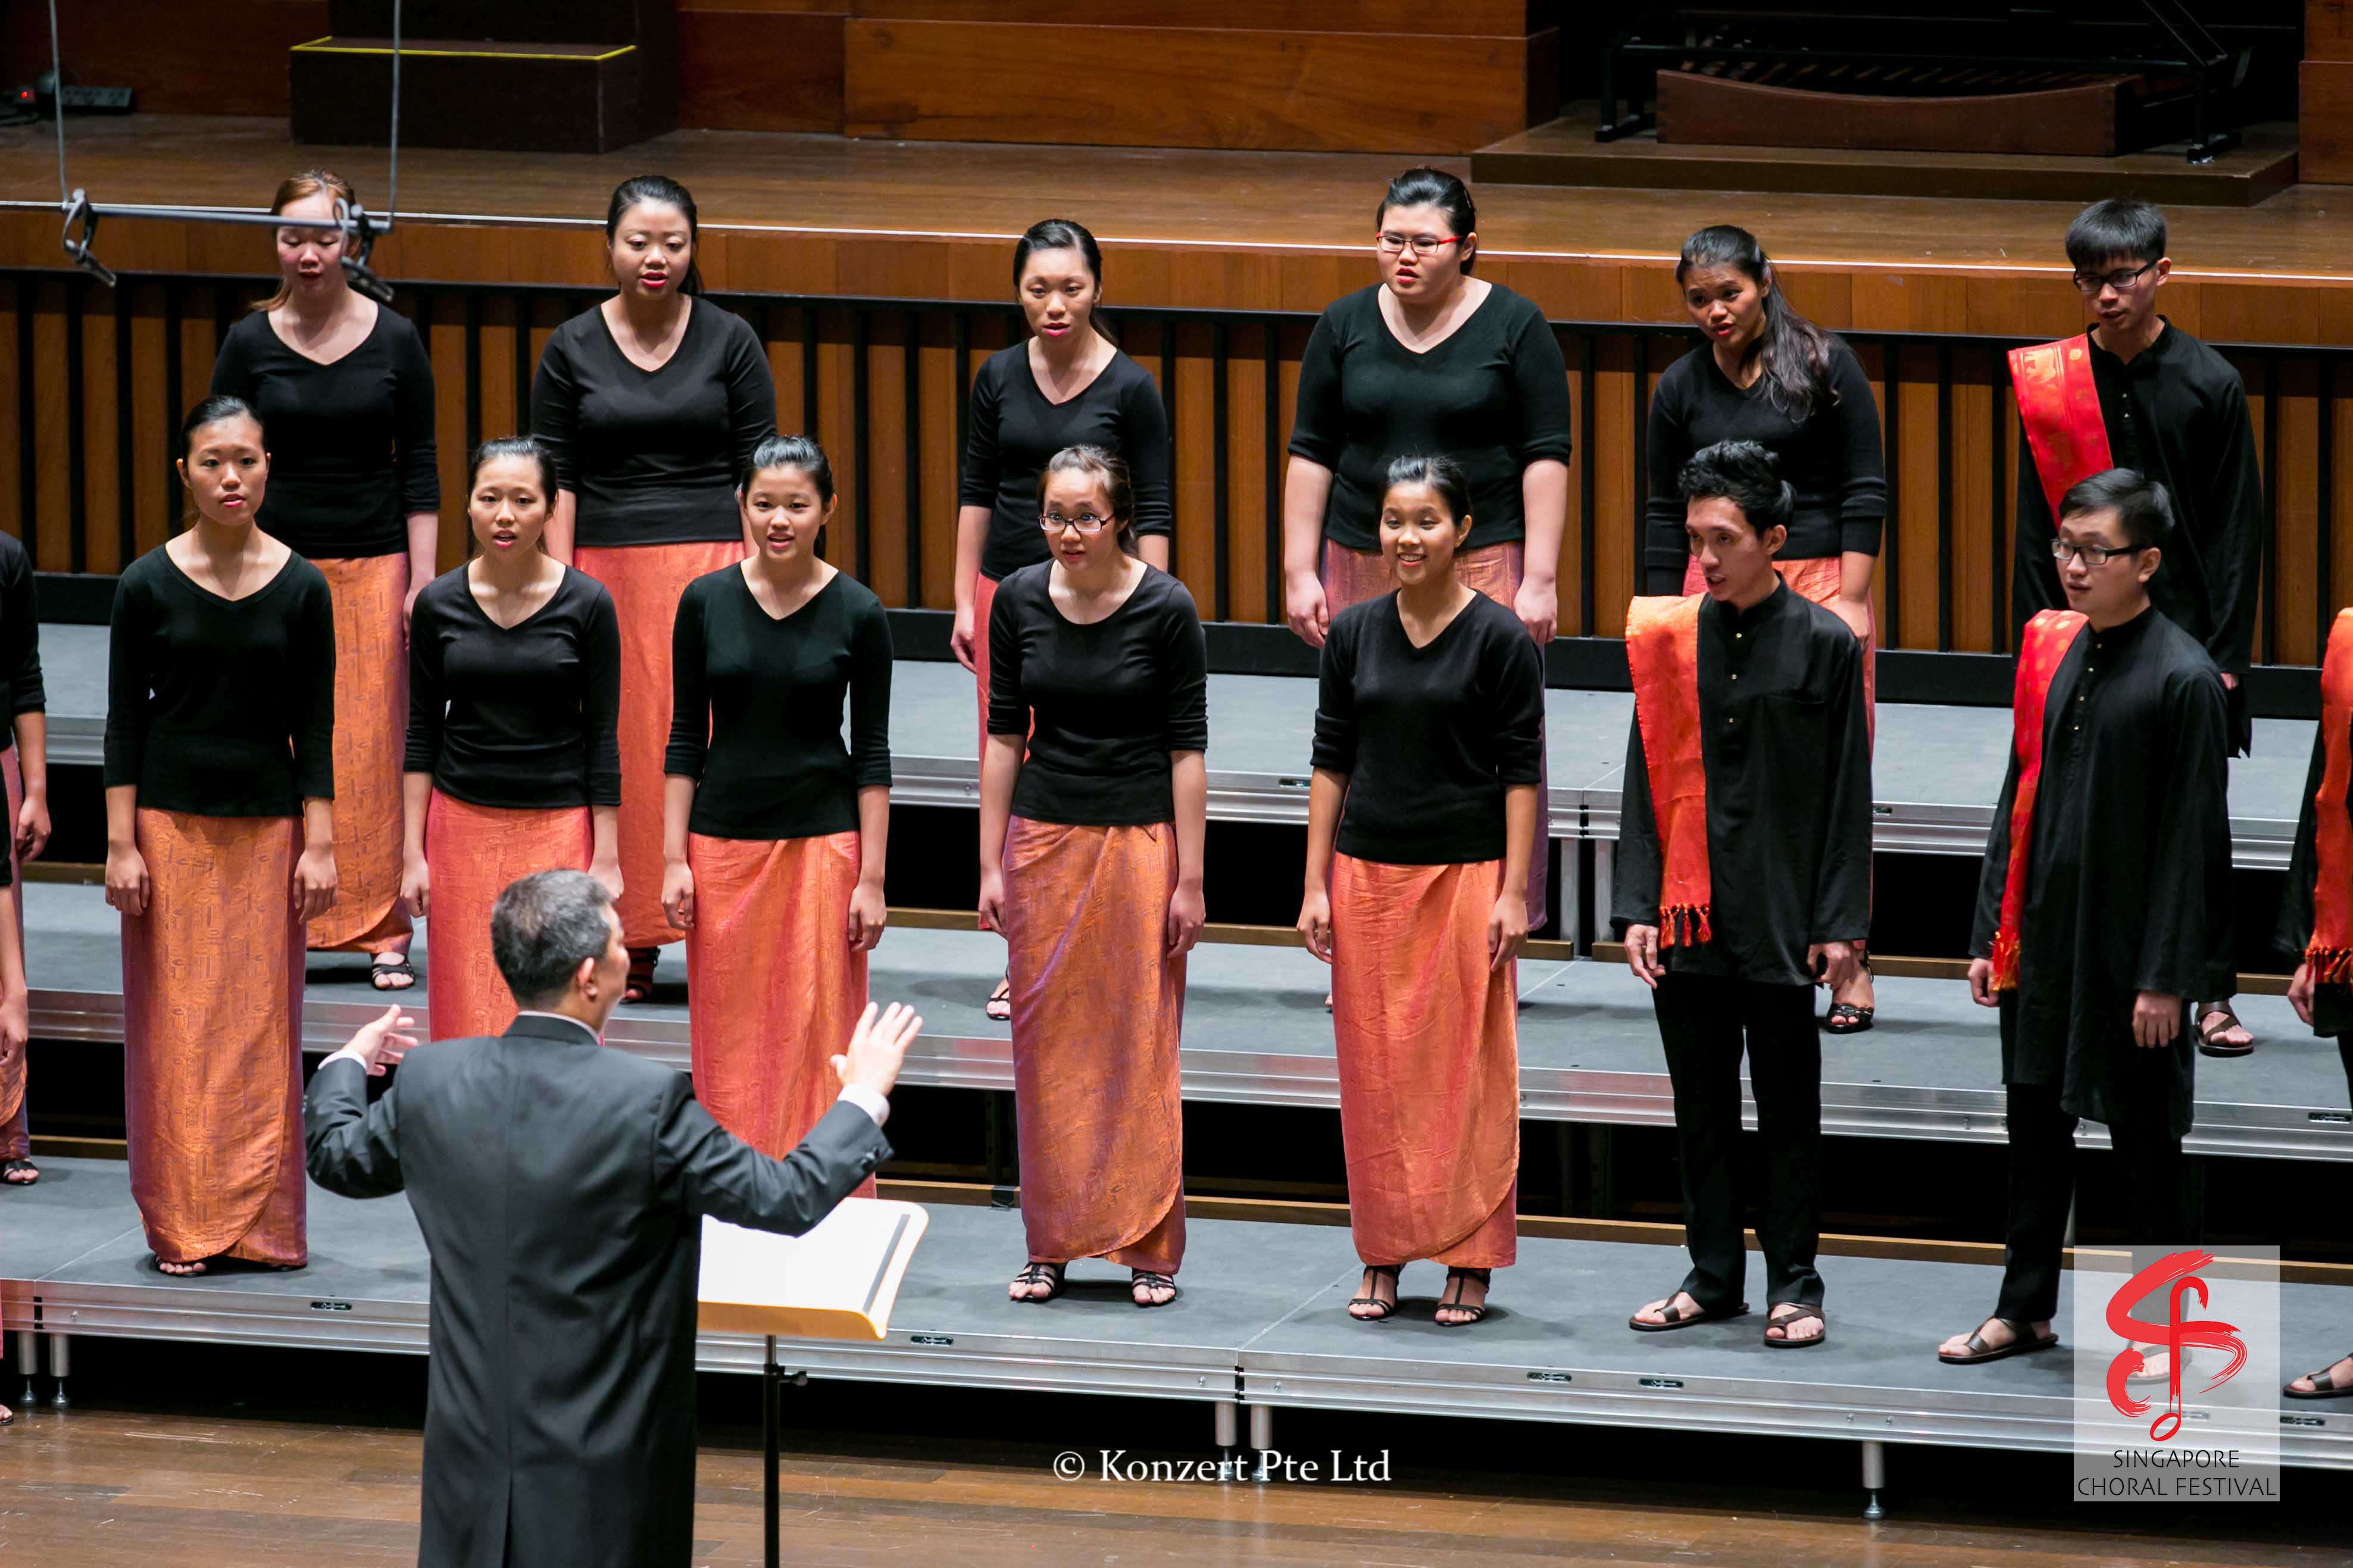 Singapore Choral Festival 7-8-15 (295).jpg